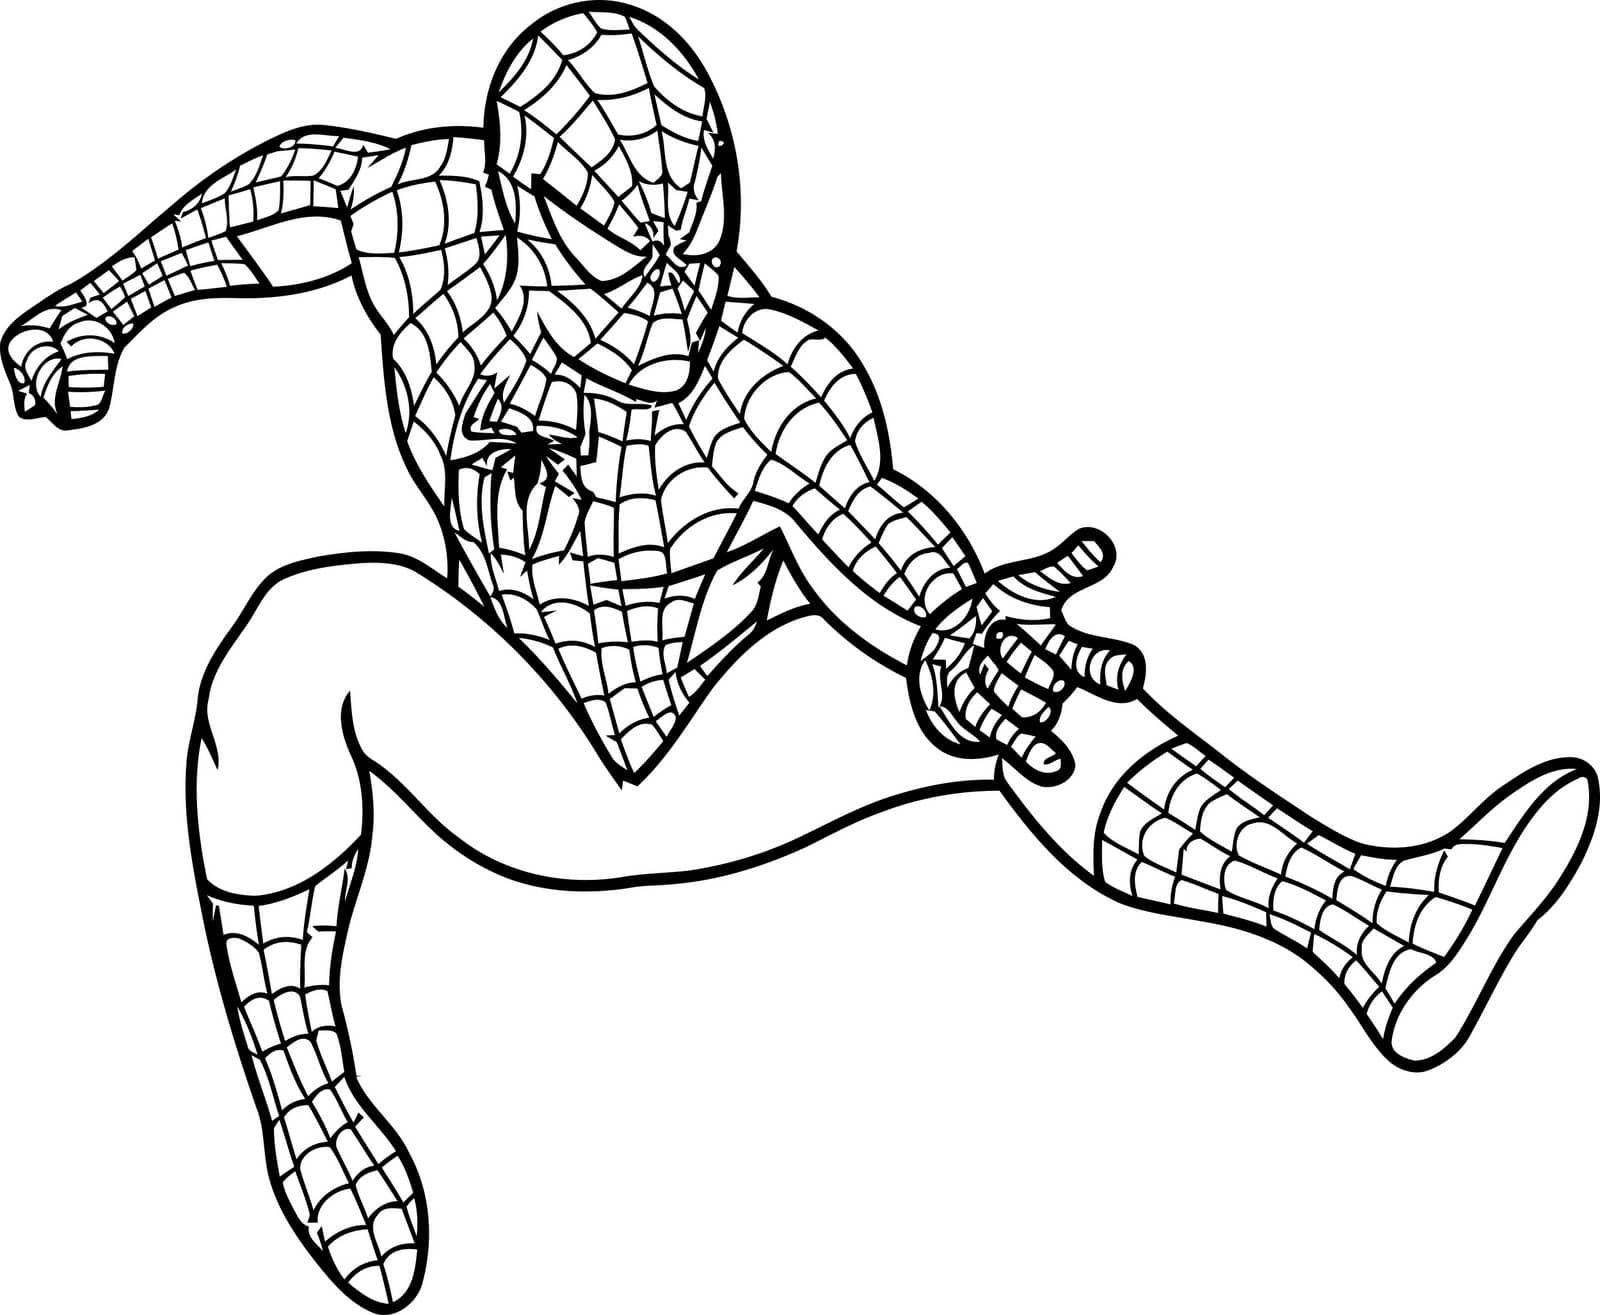 fotos-de-spiderman-2.jpg (1600×1315) | Para pintar | Pinterest ...